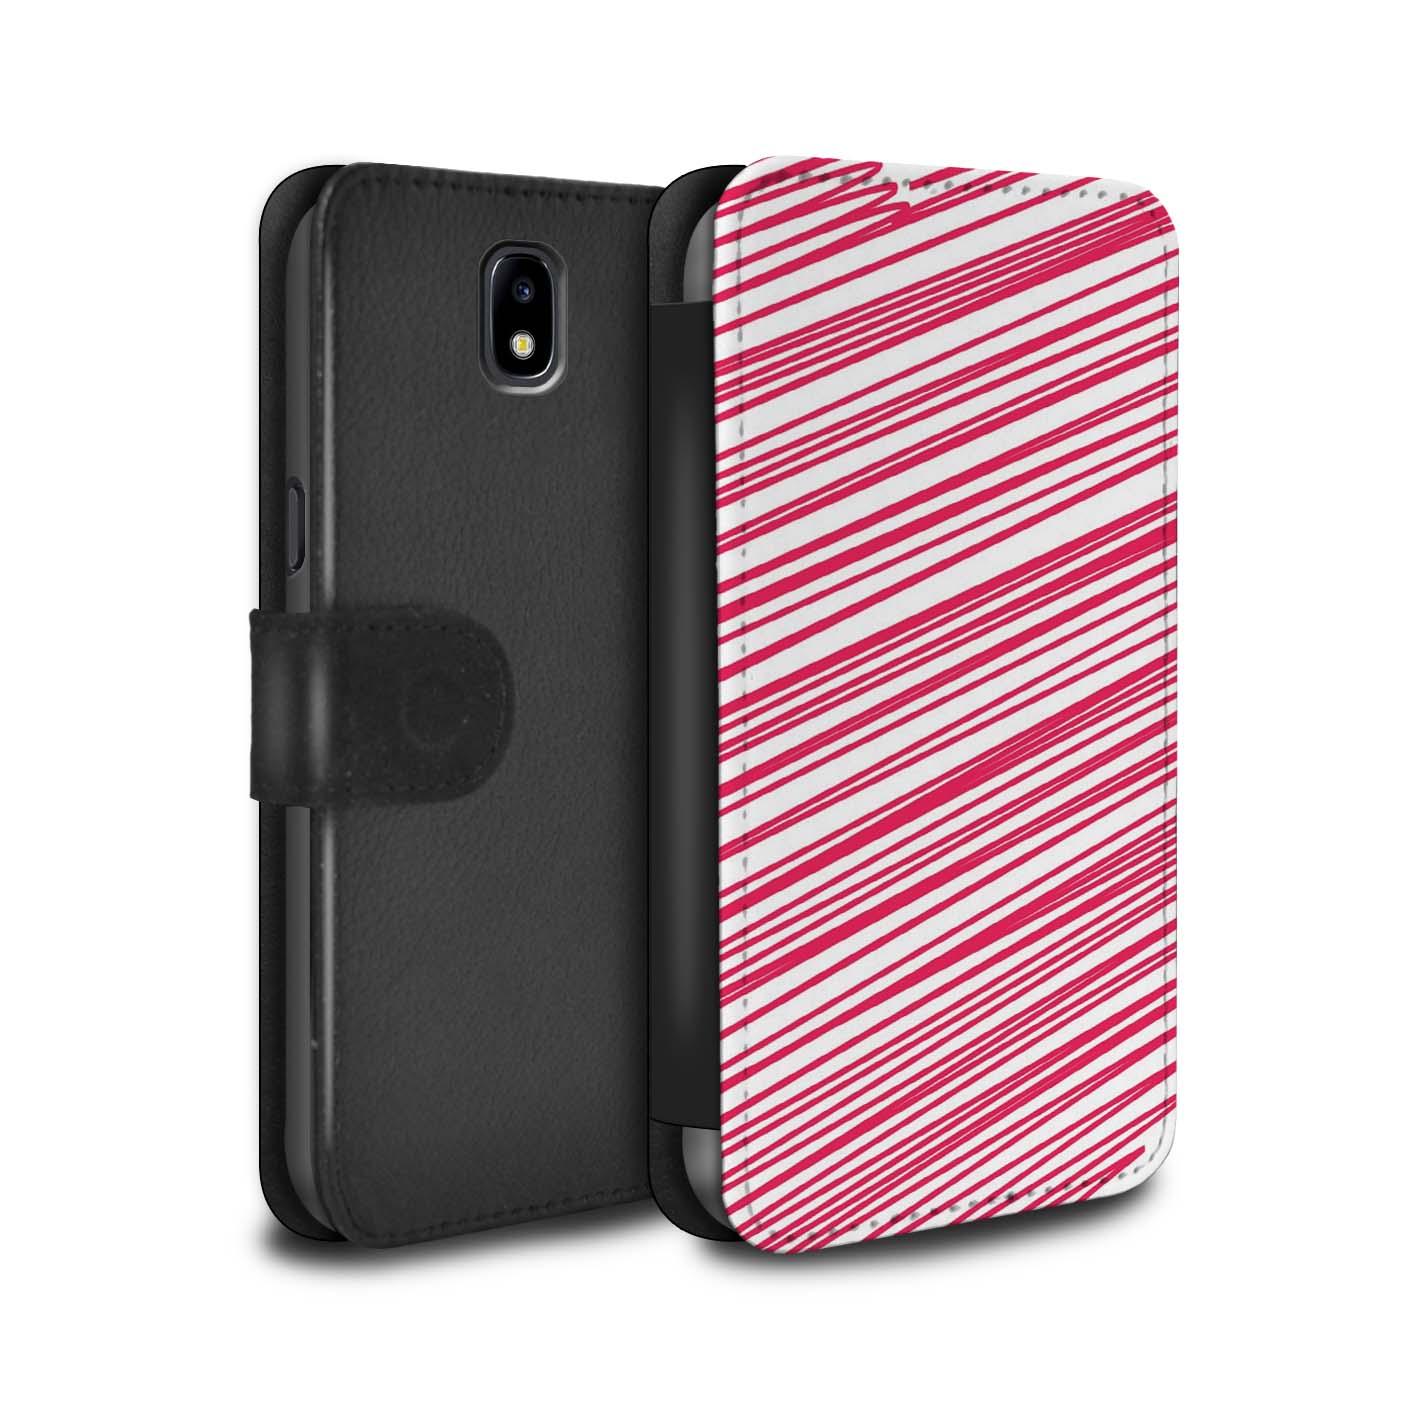 STUFF4-Coque-Etui-Case-Cuir-PU-pour-Samsung-Galaxy-J3-2017-J330-Mode-Rouge